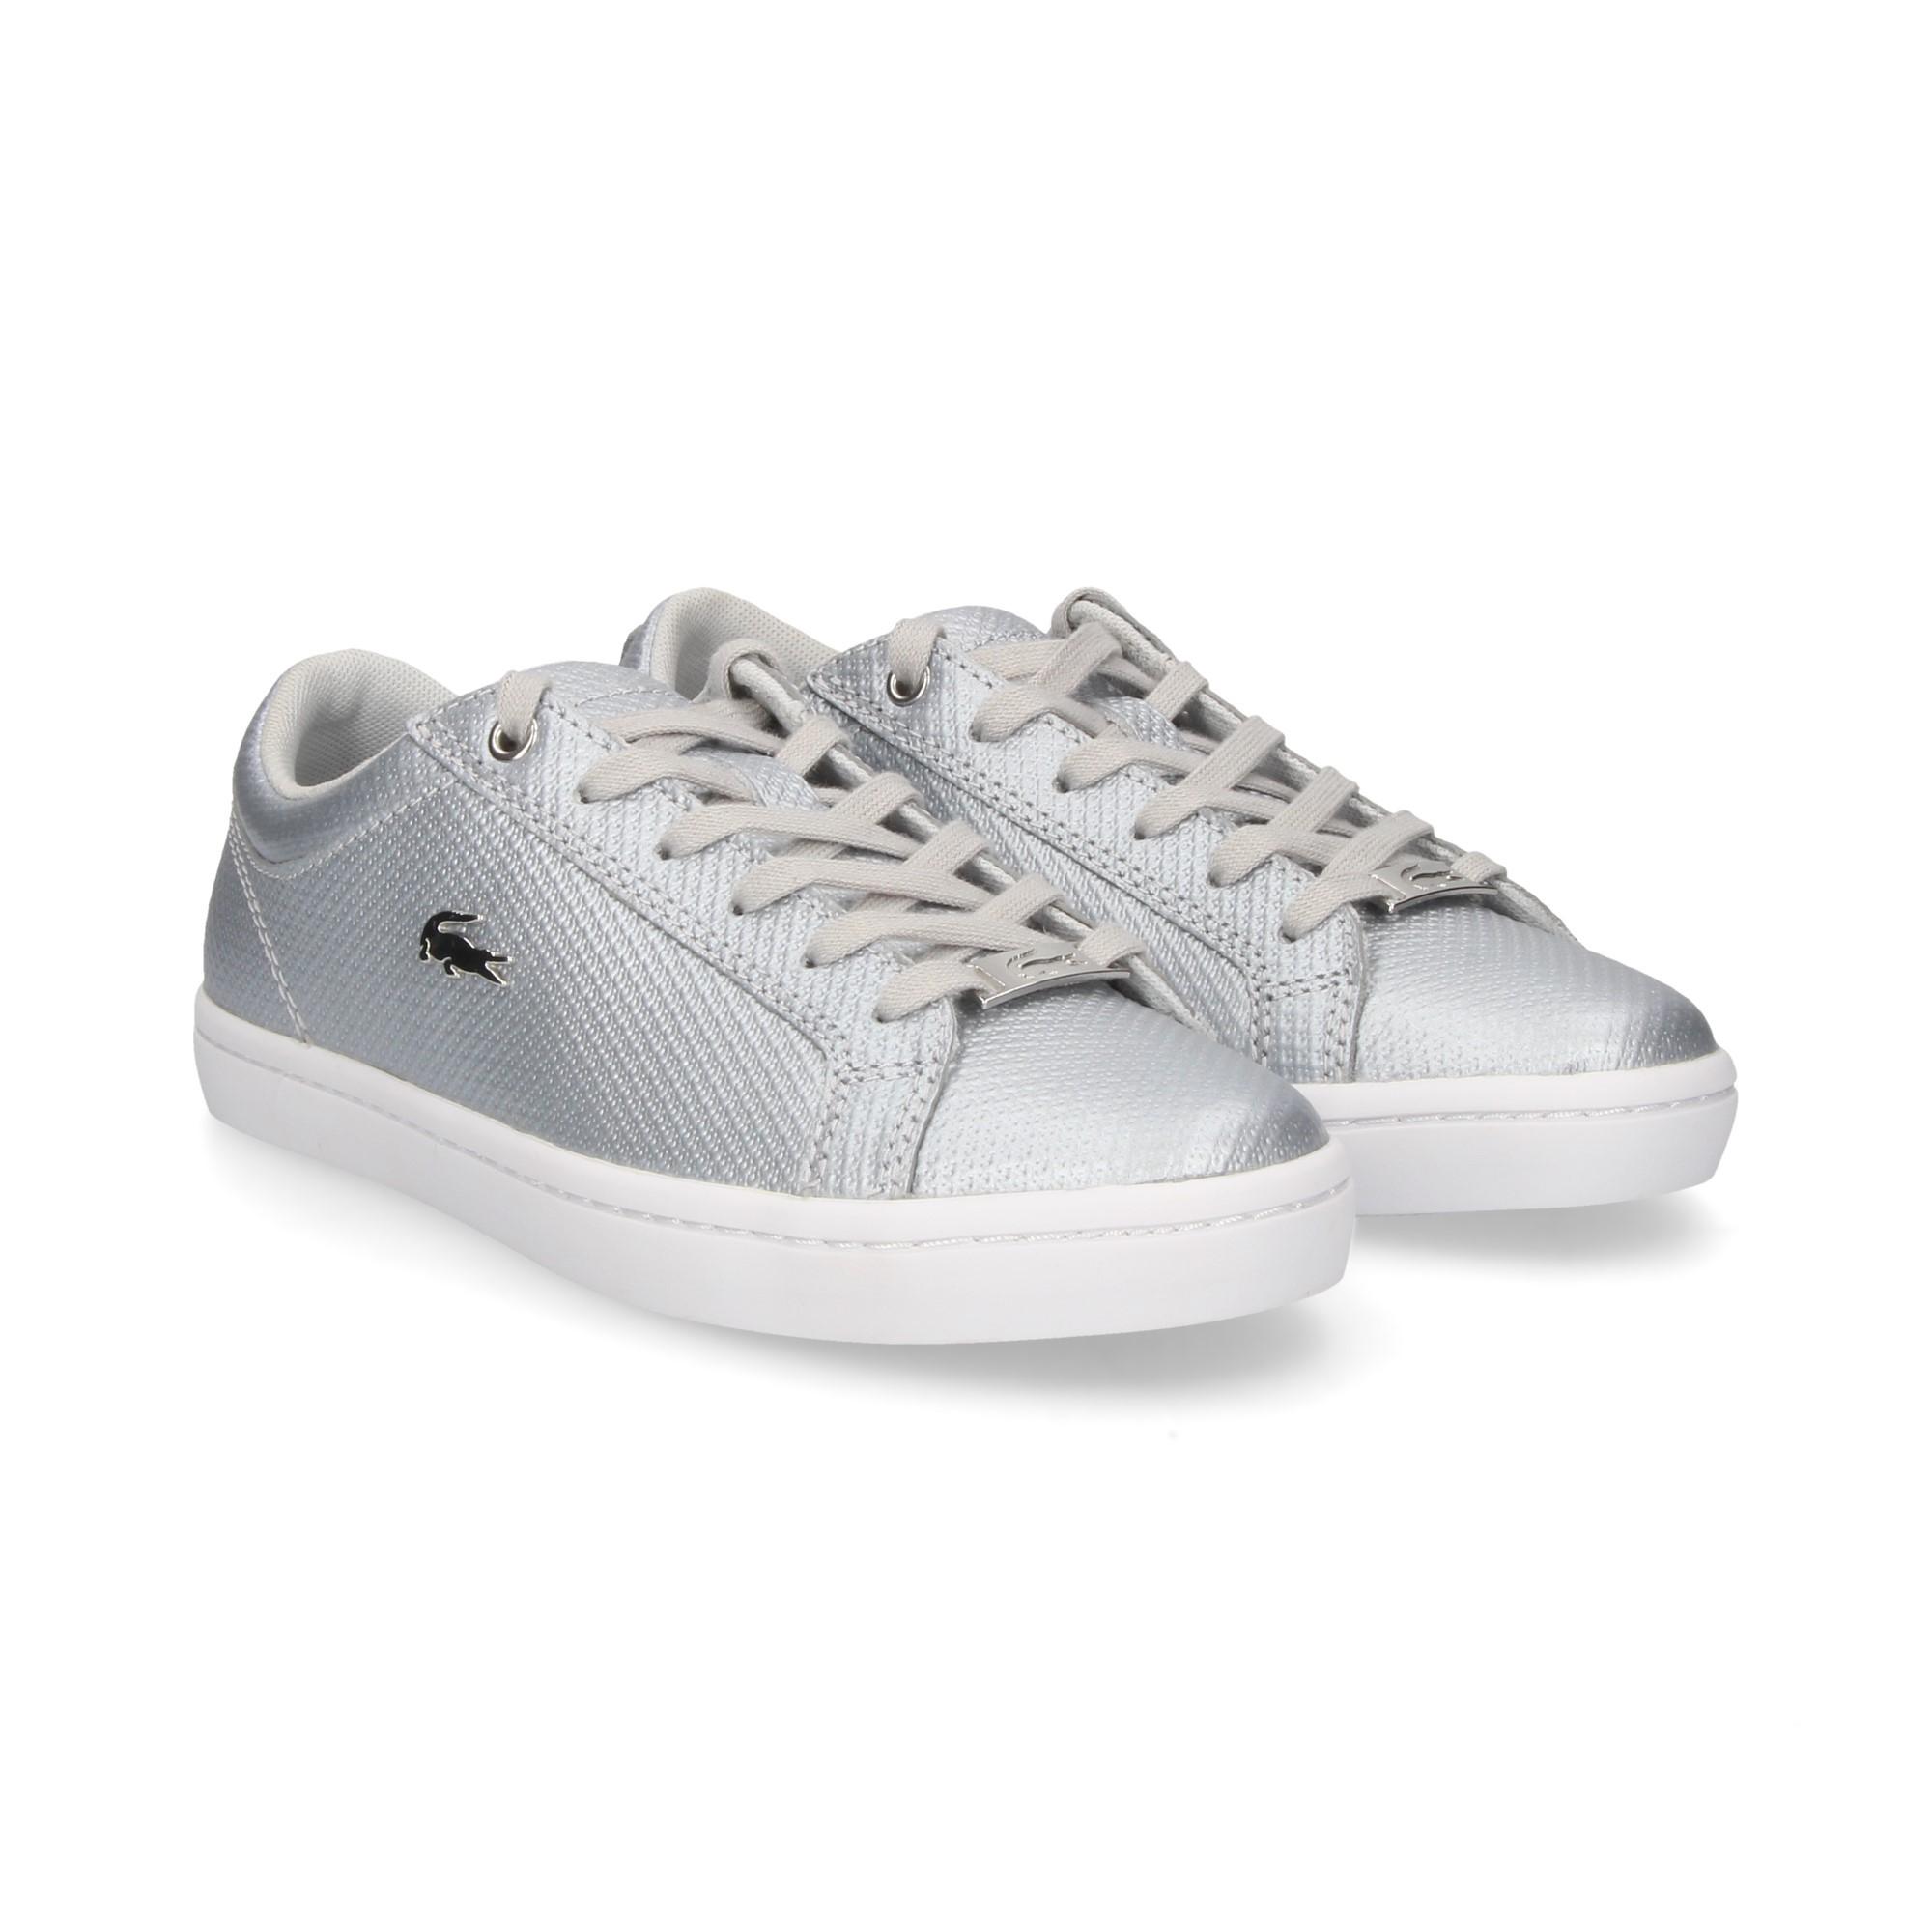 LACOSTE Women s Sneakers 36CAW0038 19L SLV WHT 75f9ea1dfc